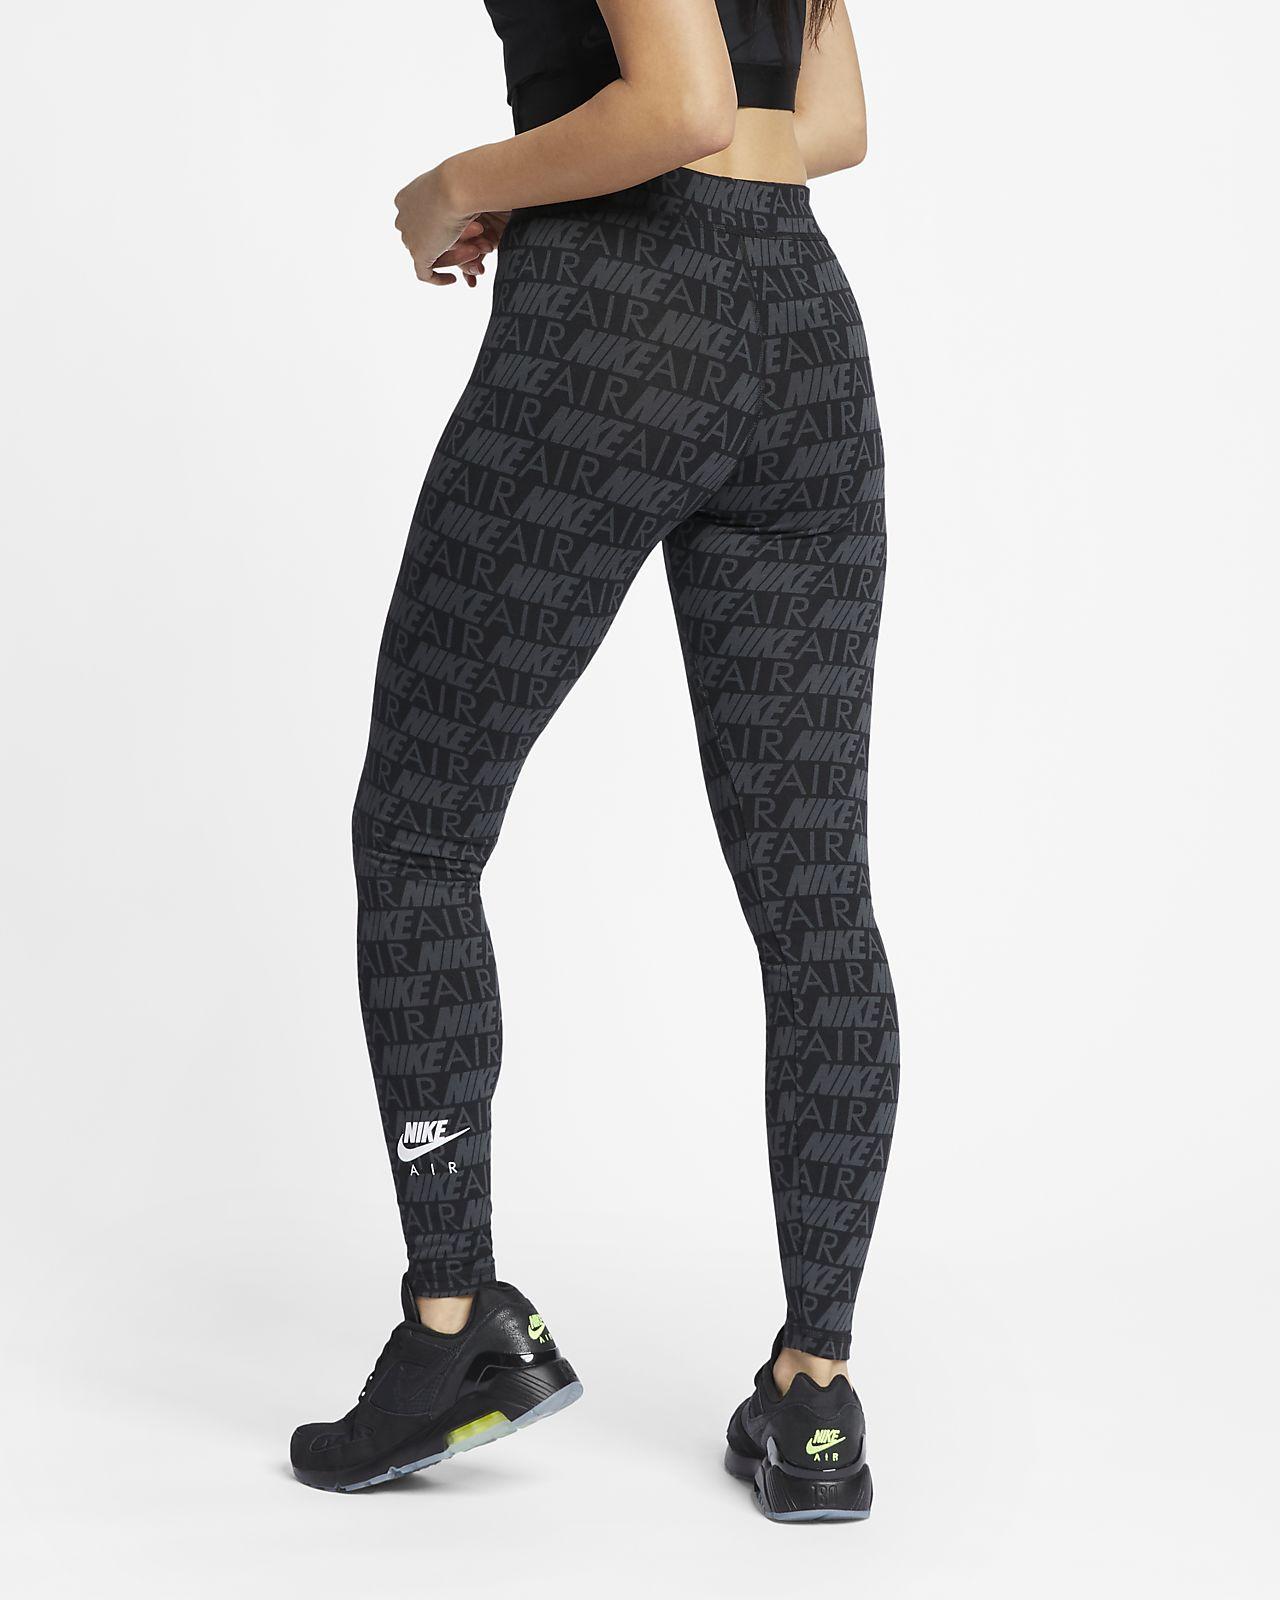 Nike Air mintás női leggings